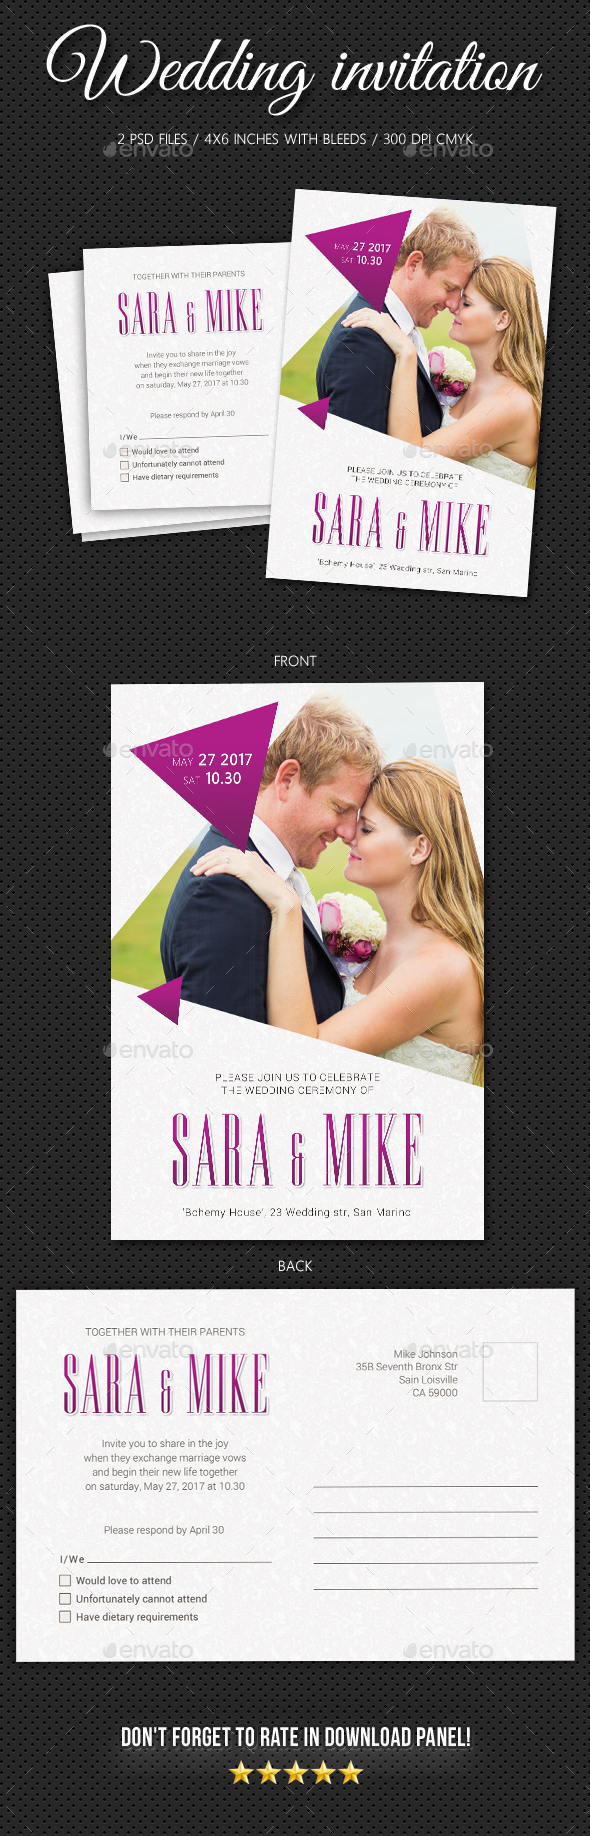 Wedding Invitation V11 - Weddings Cards & Invites